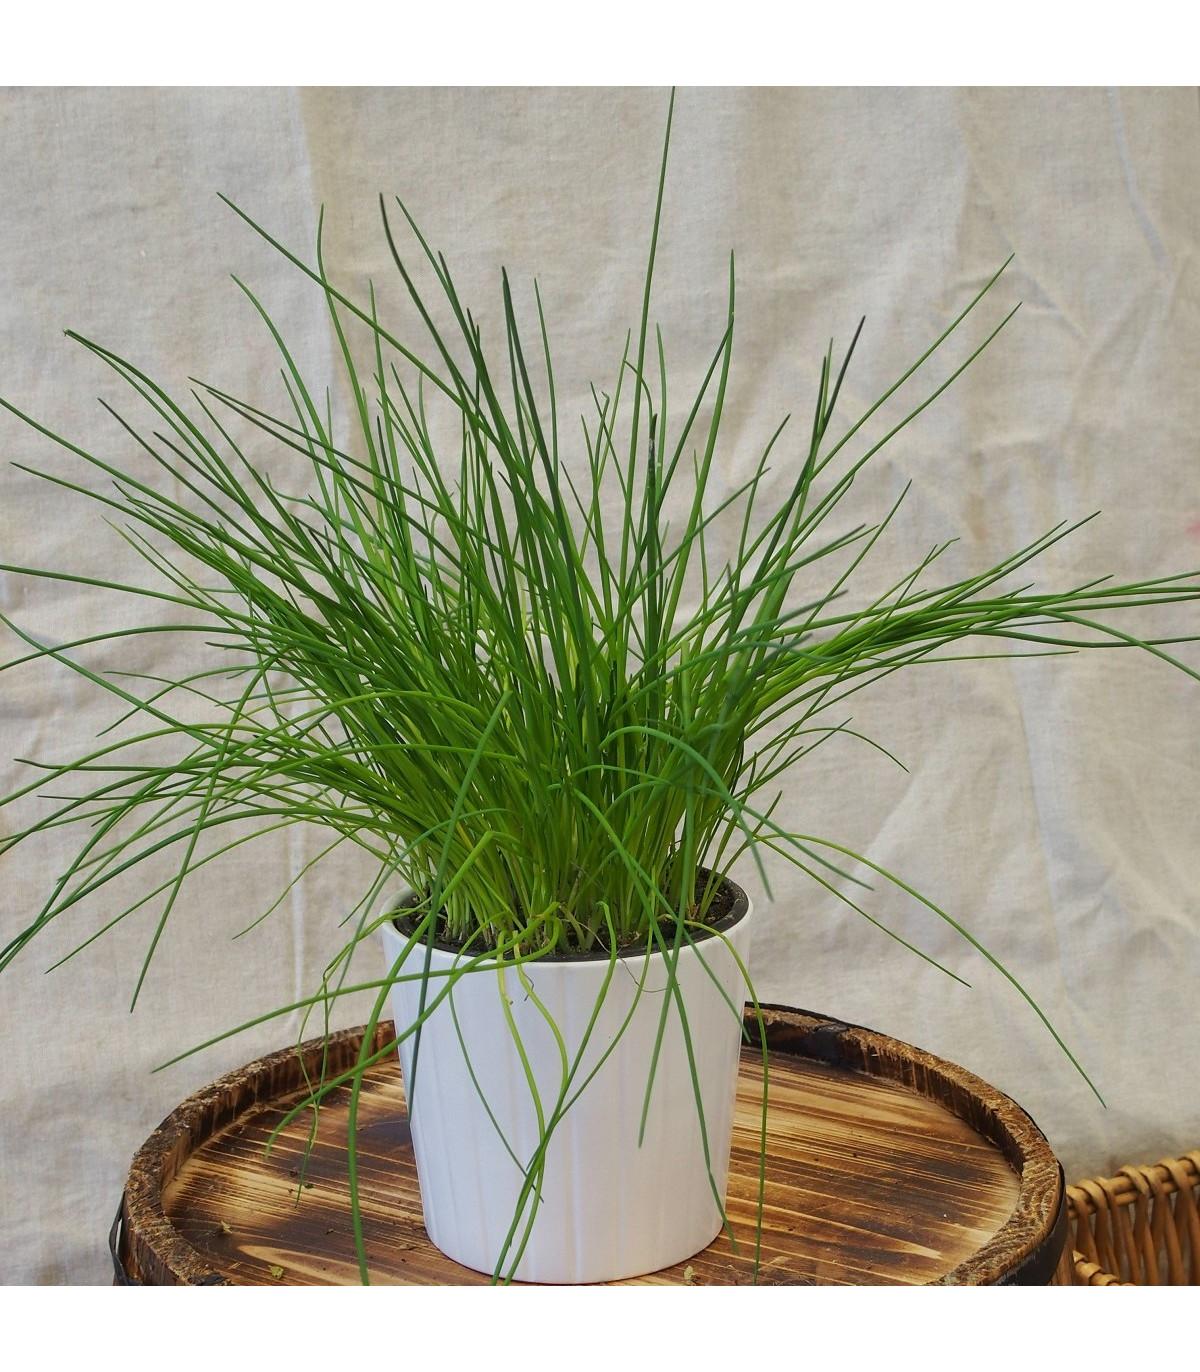 Pažitka pražská - Allium schoenoprasum L. - osivo pažitky - 750 ks